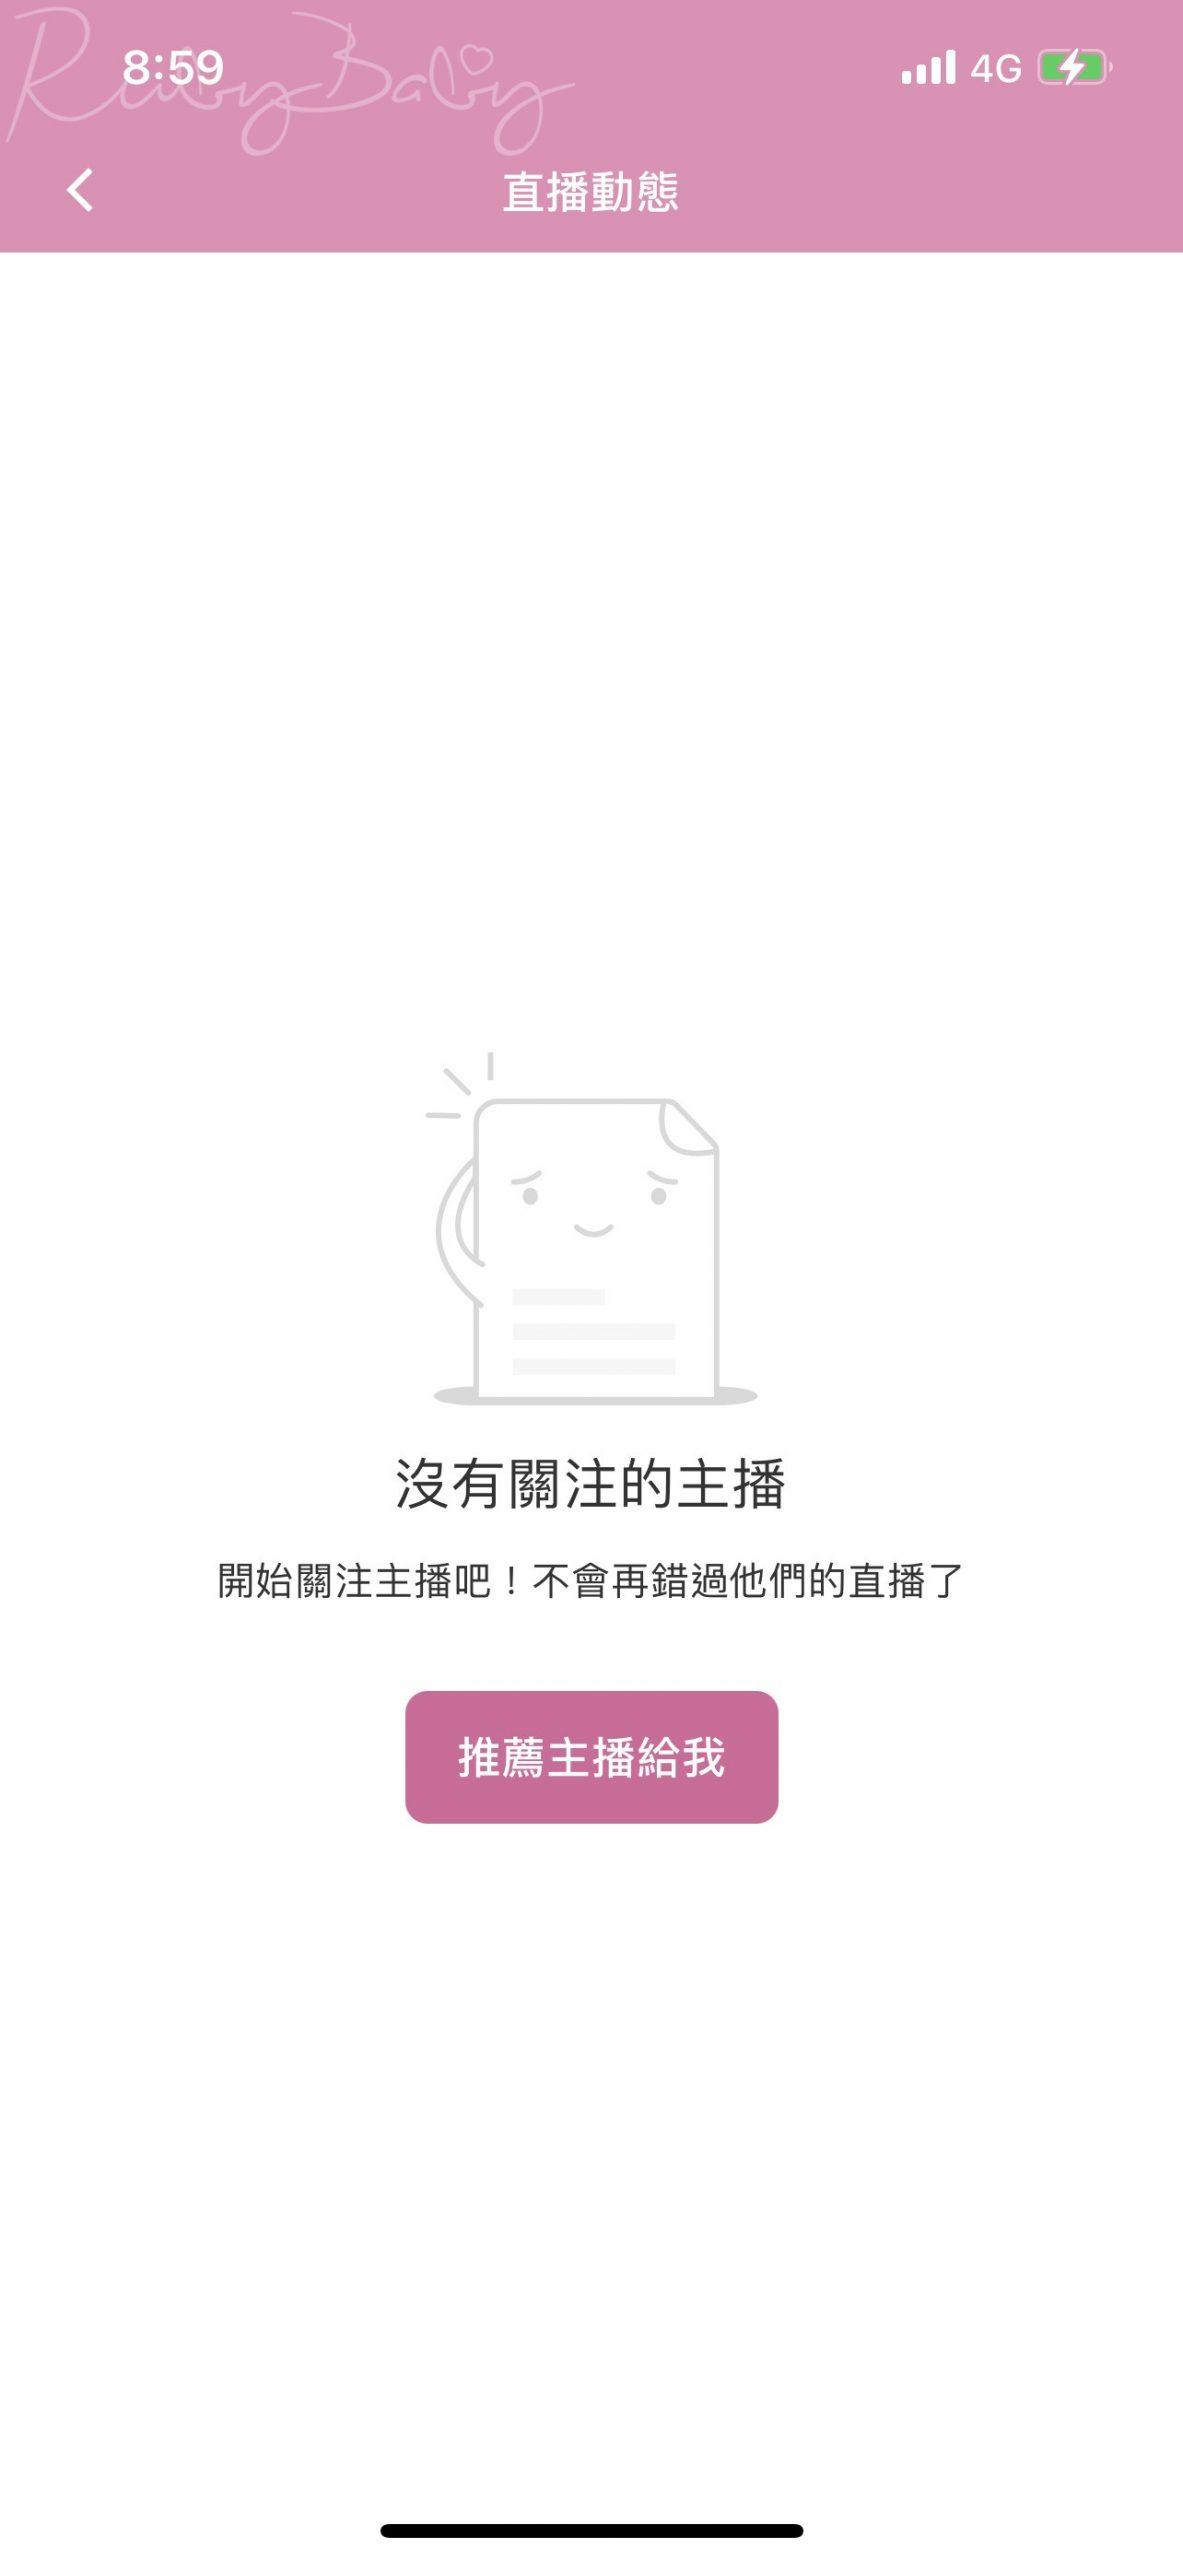 iPair 直播功能